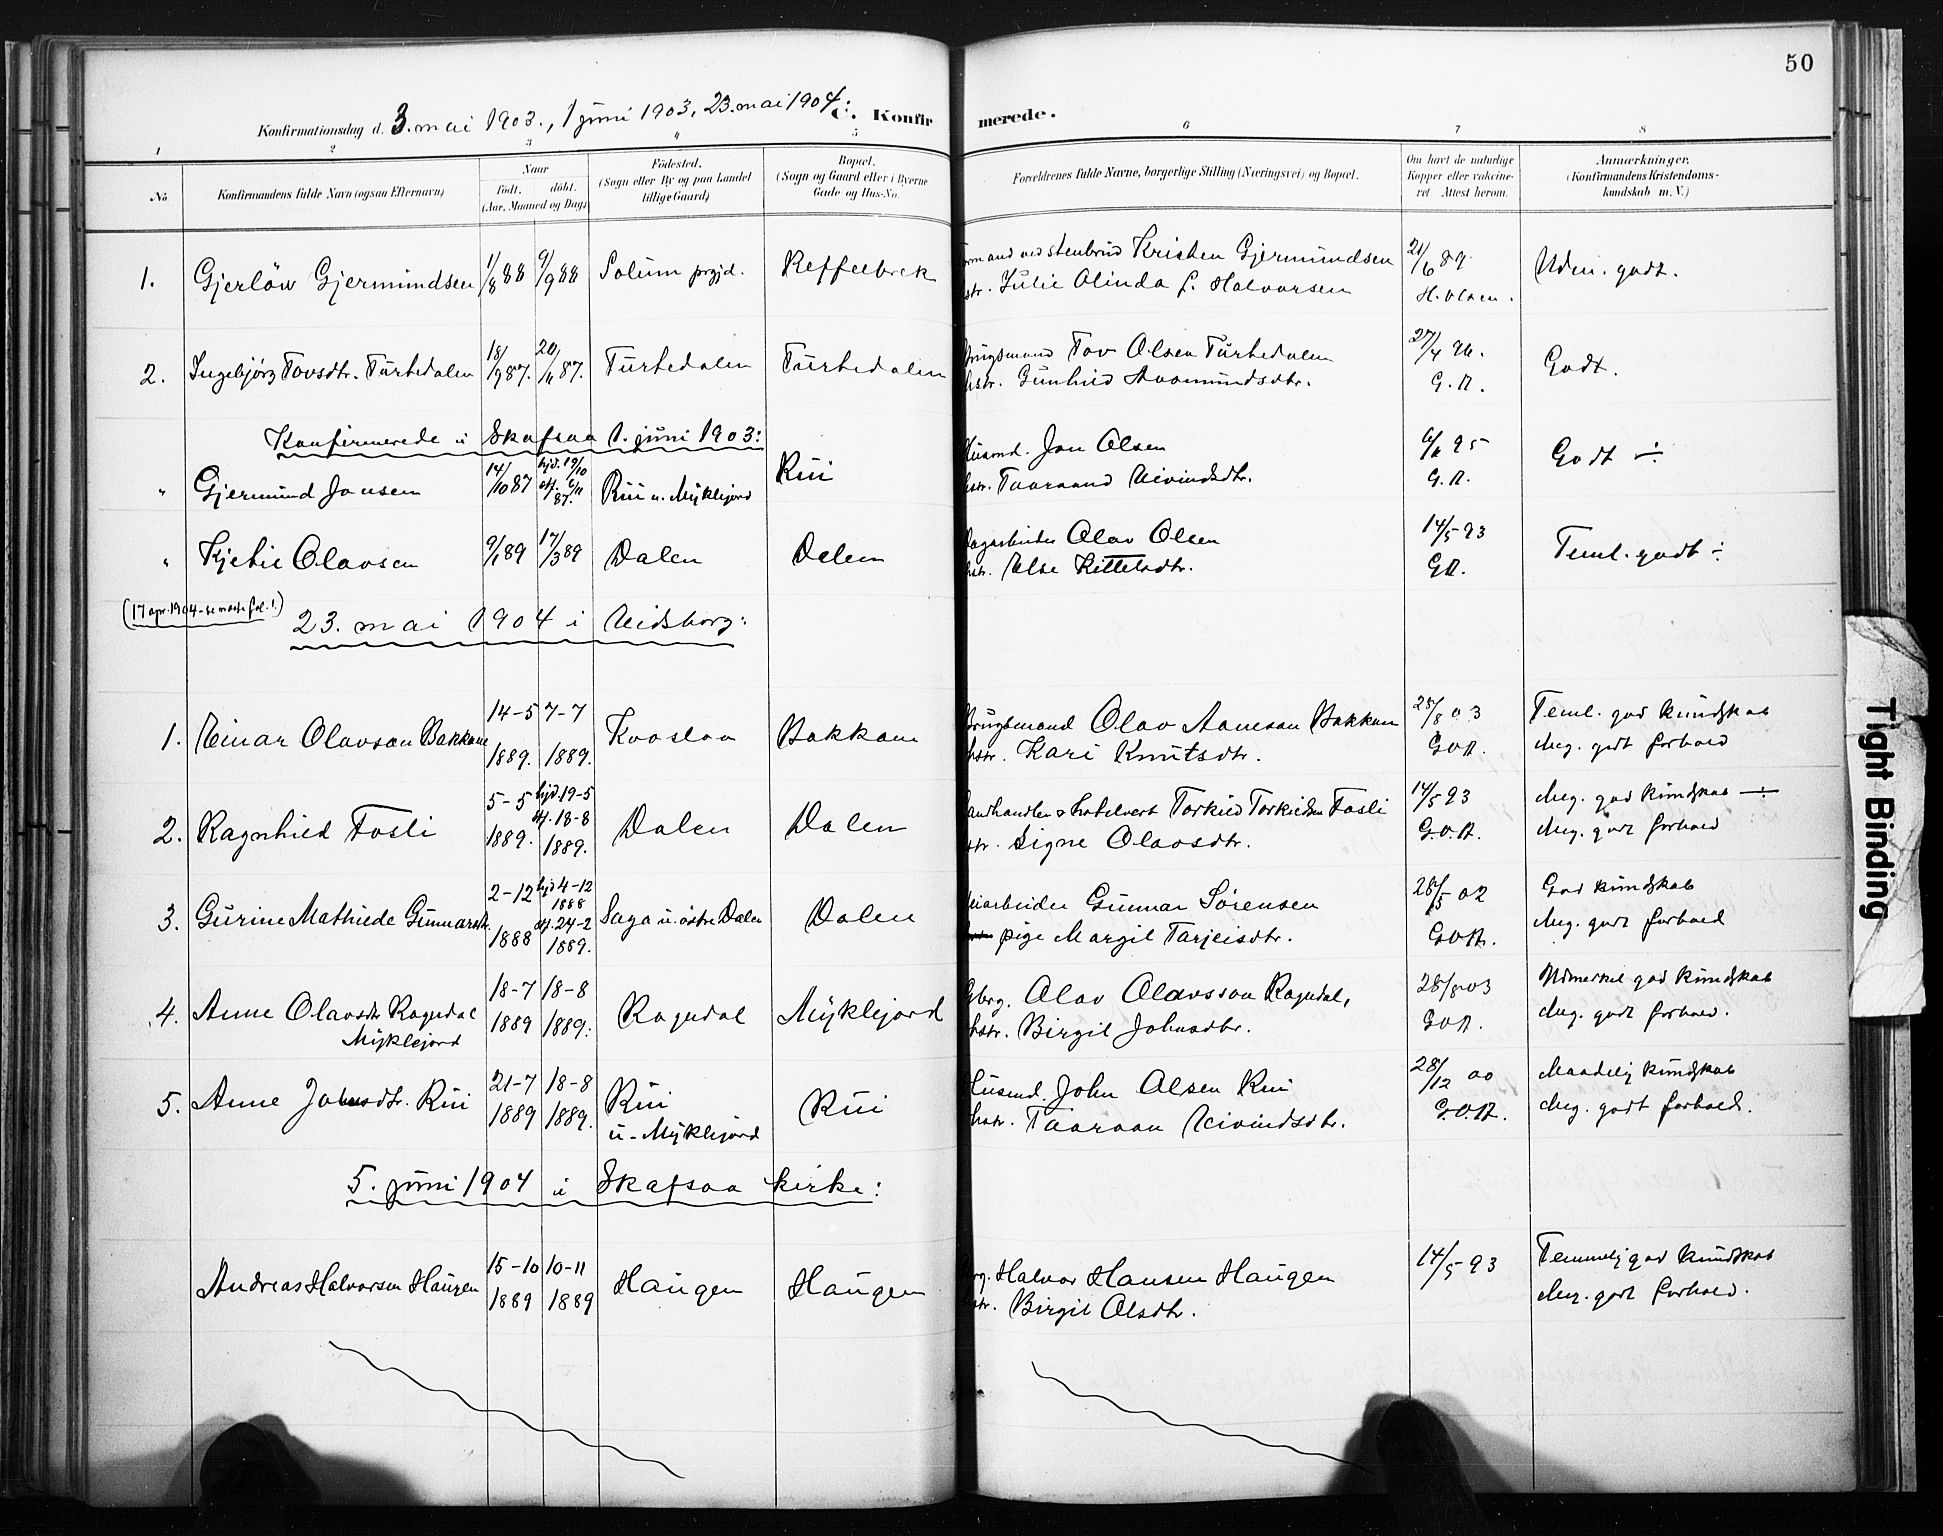 SAKO, Lårdal kirkebøker, F/Fb/L0002: Ministerialbok nr. II 2, 1887-1918, s. 50